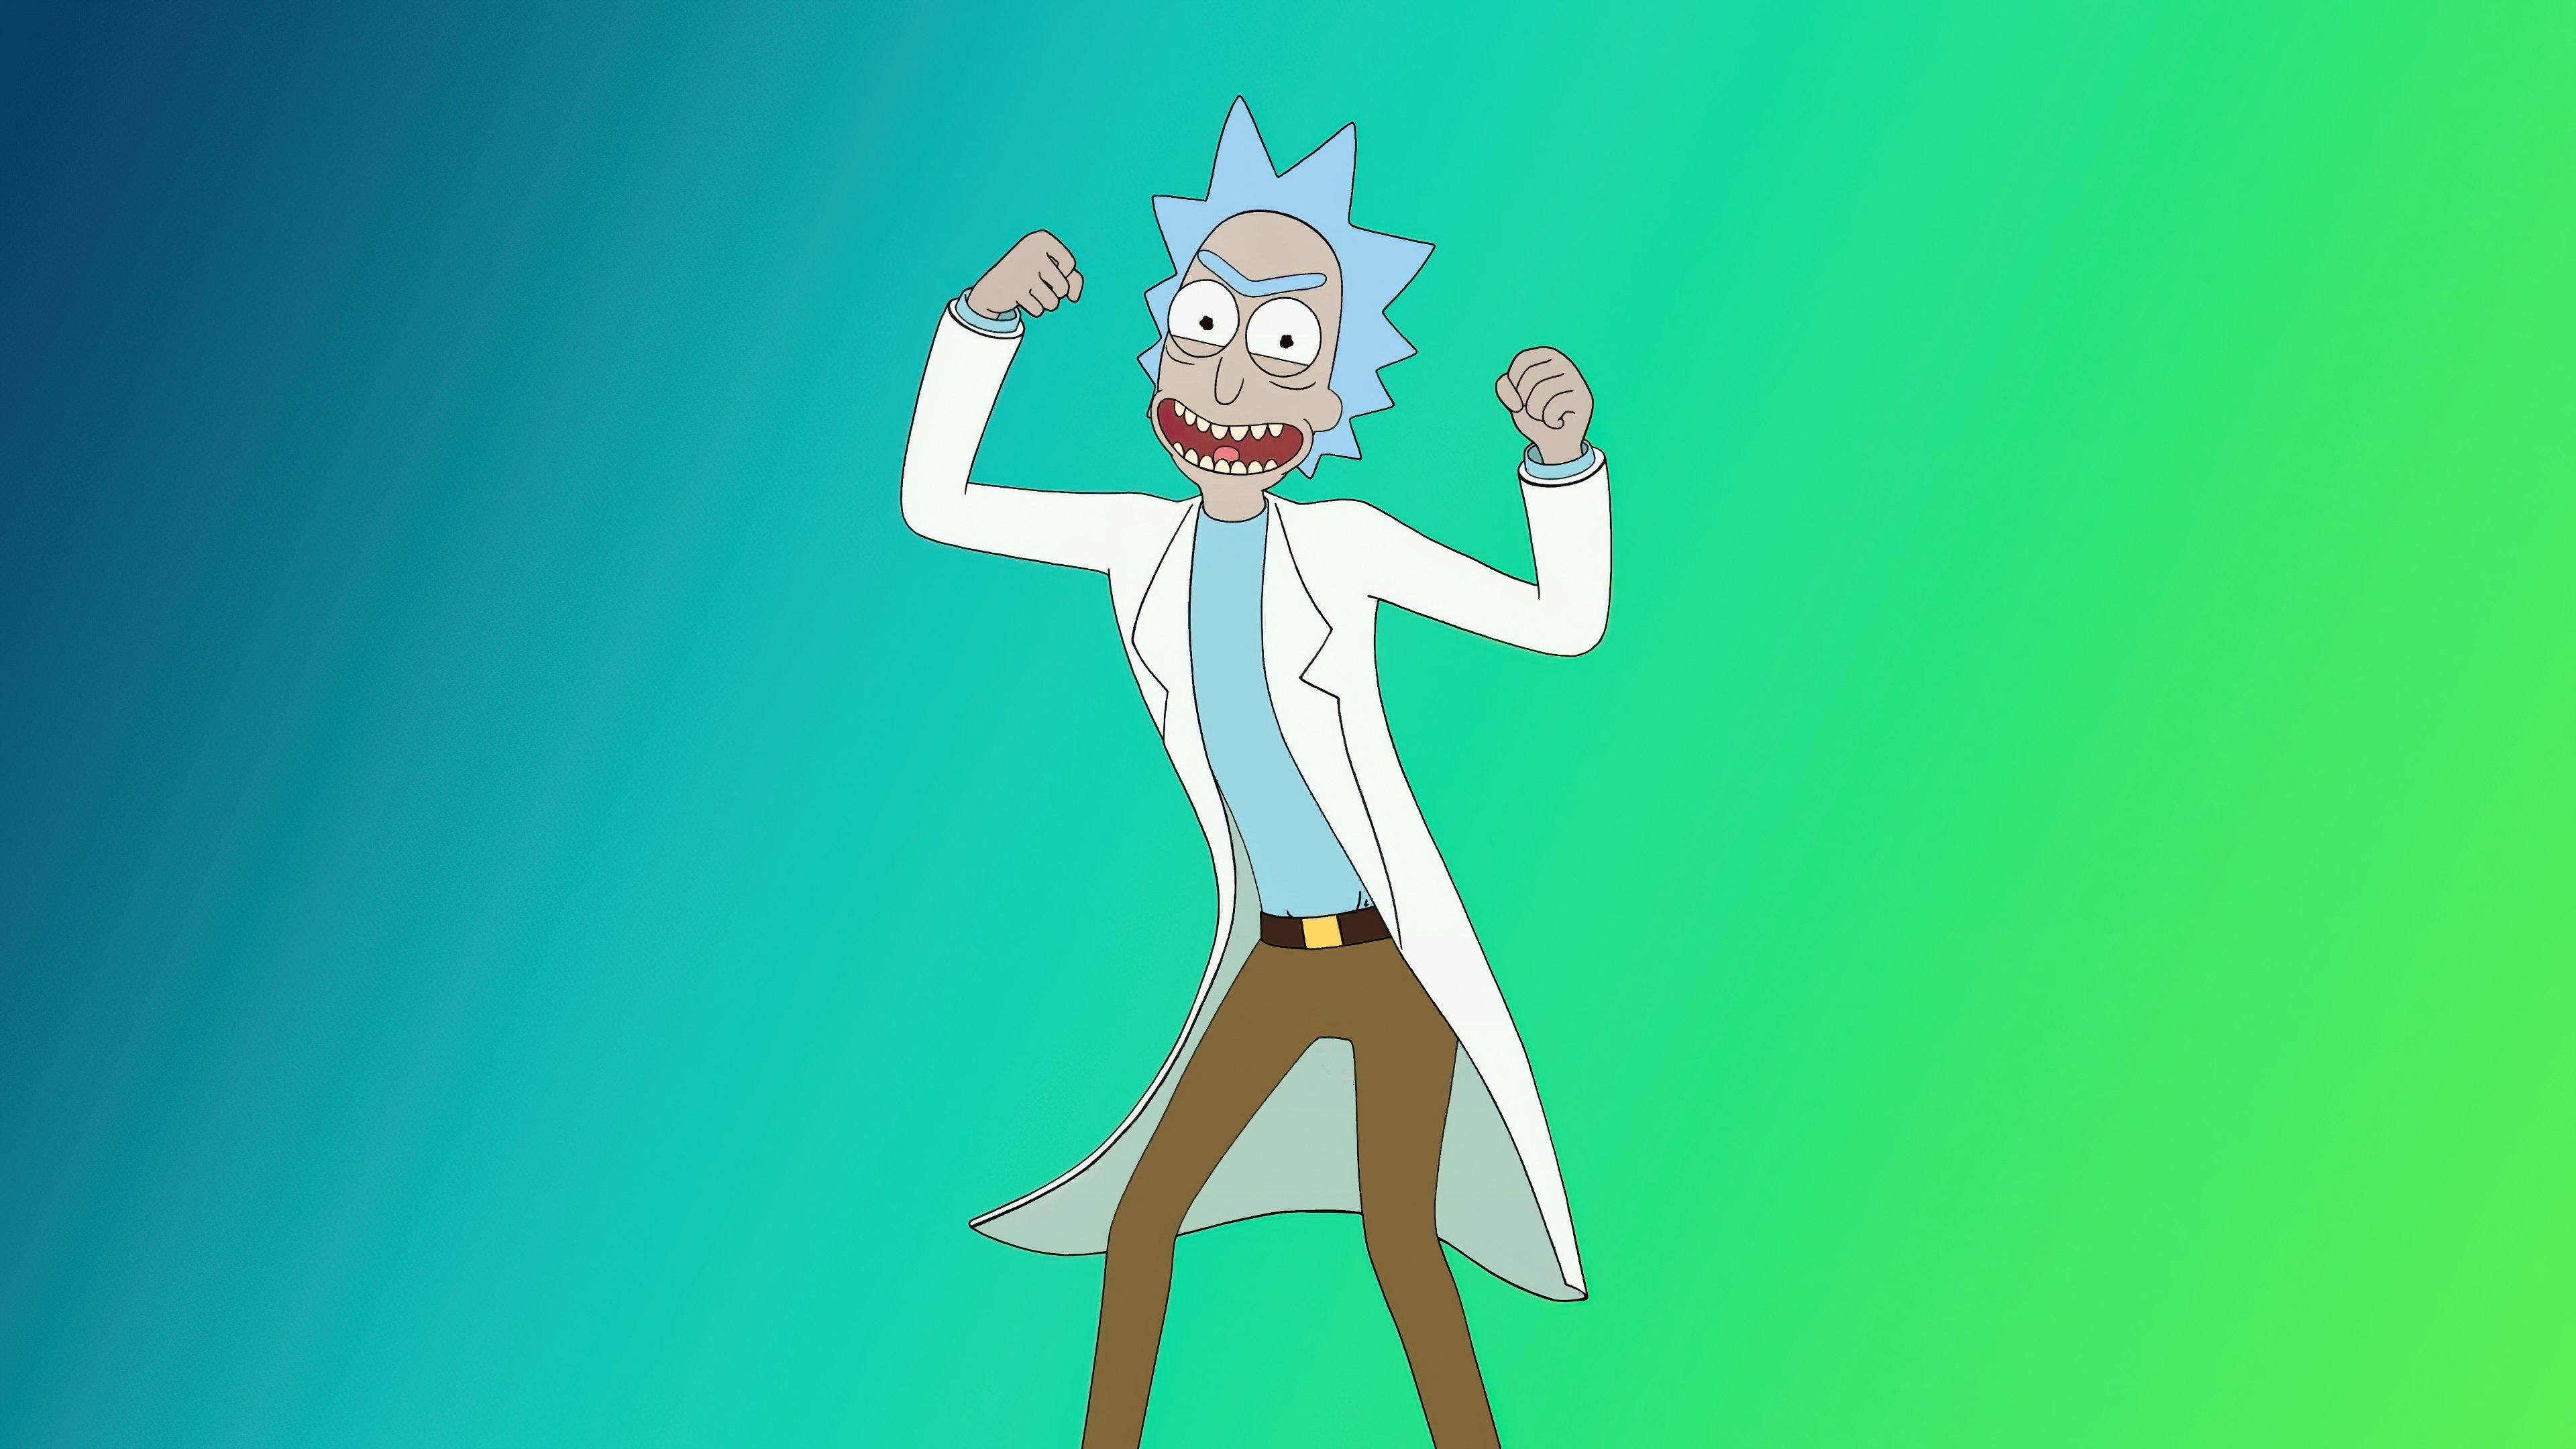 Wallpaper Rick and Morty dancing